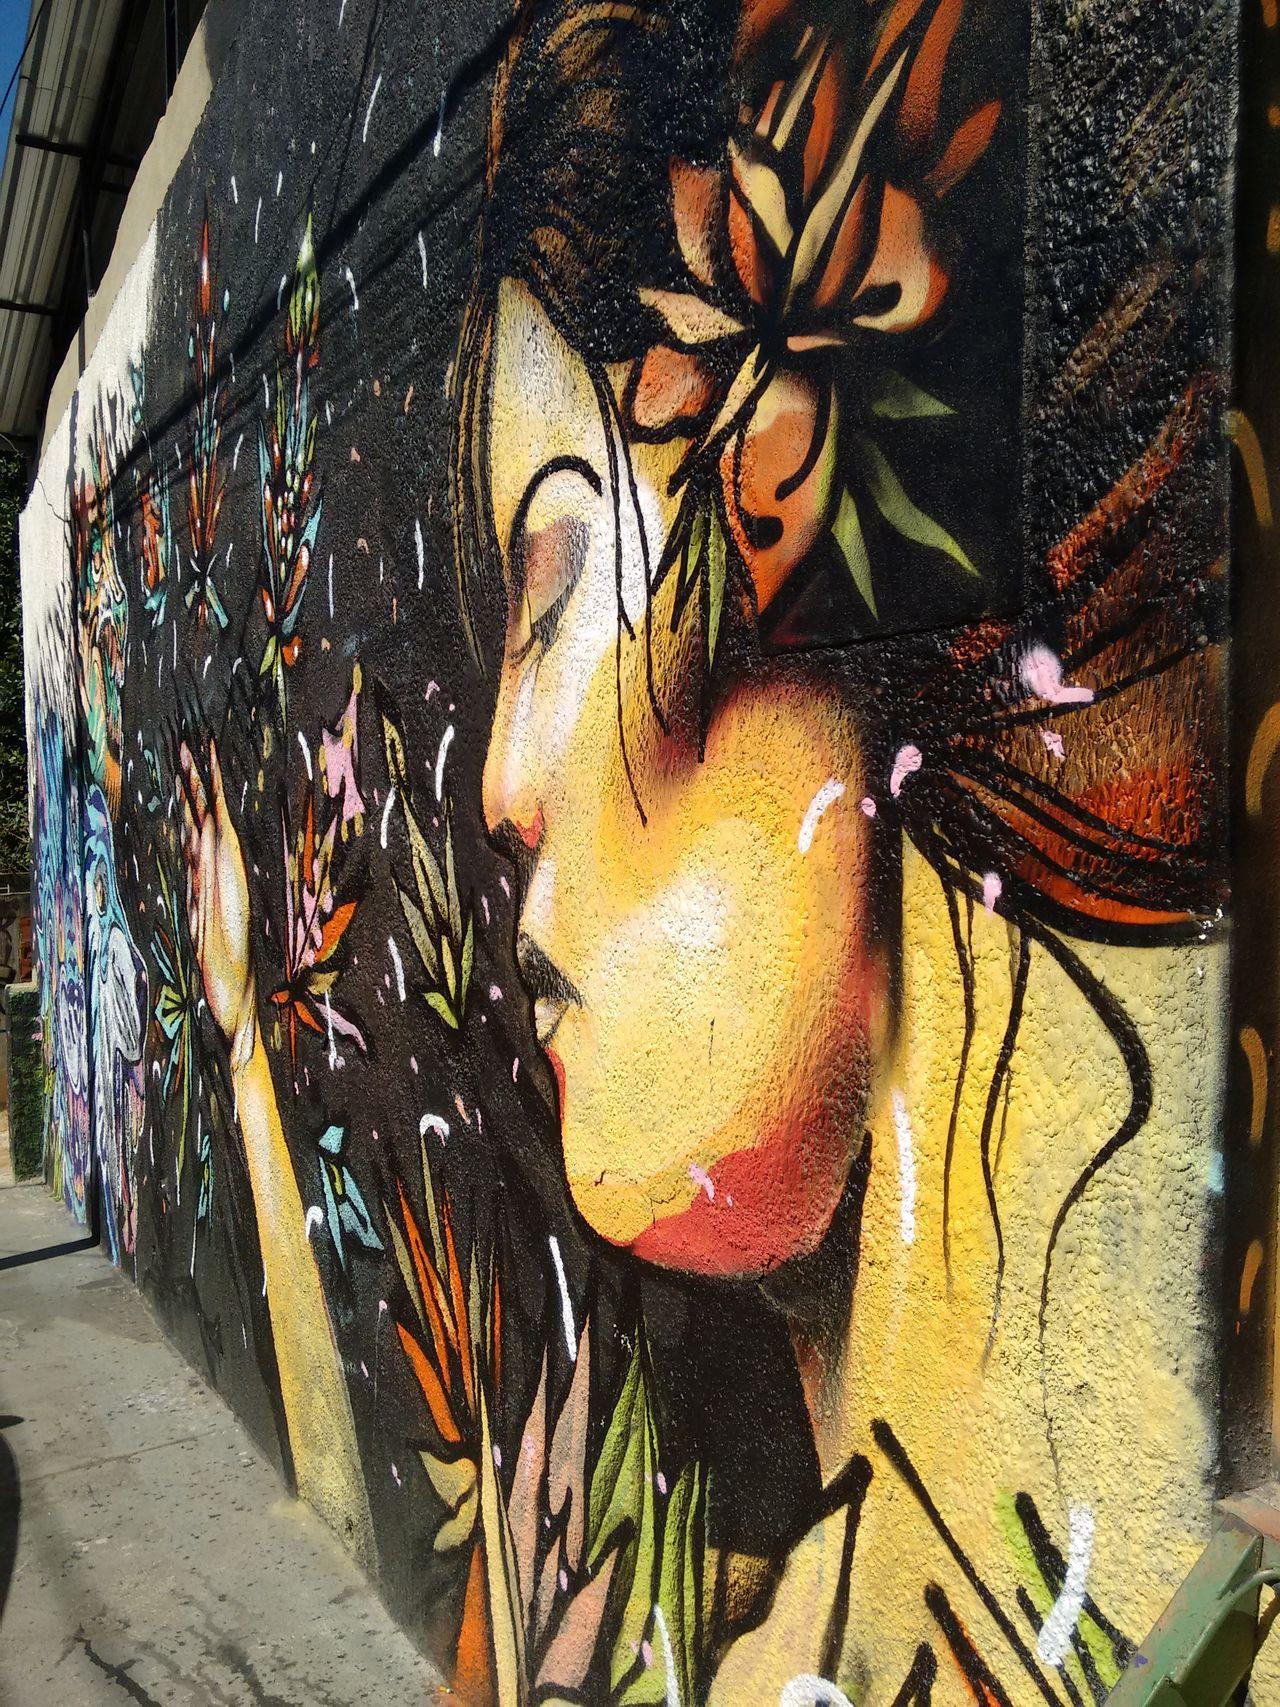 Creativity Culture Colorful Worldwide World Traveller Day Wall Painting/grafitti Grafitti Street Art Graffiti & Streetart Rio De Janeiro, Brazil Wall Murals